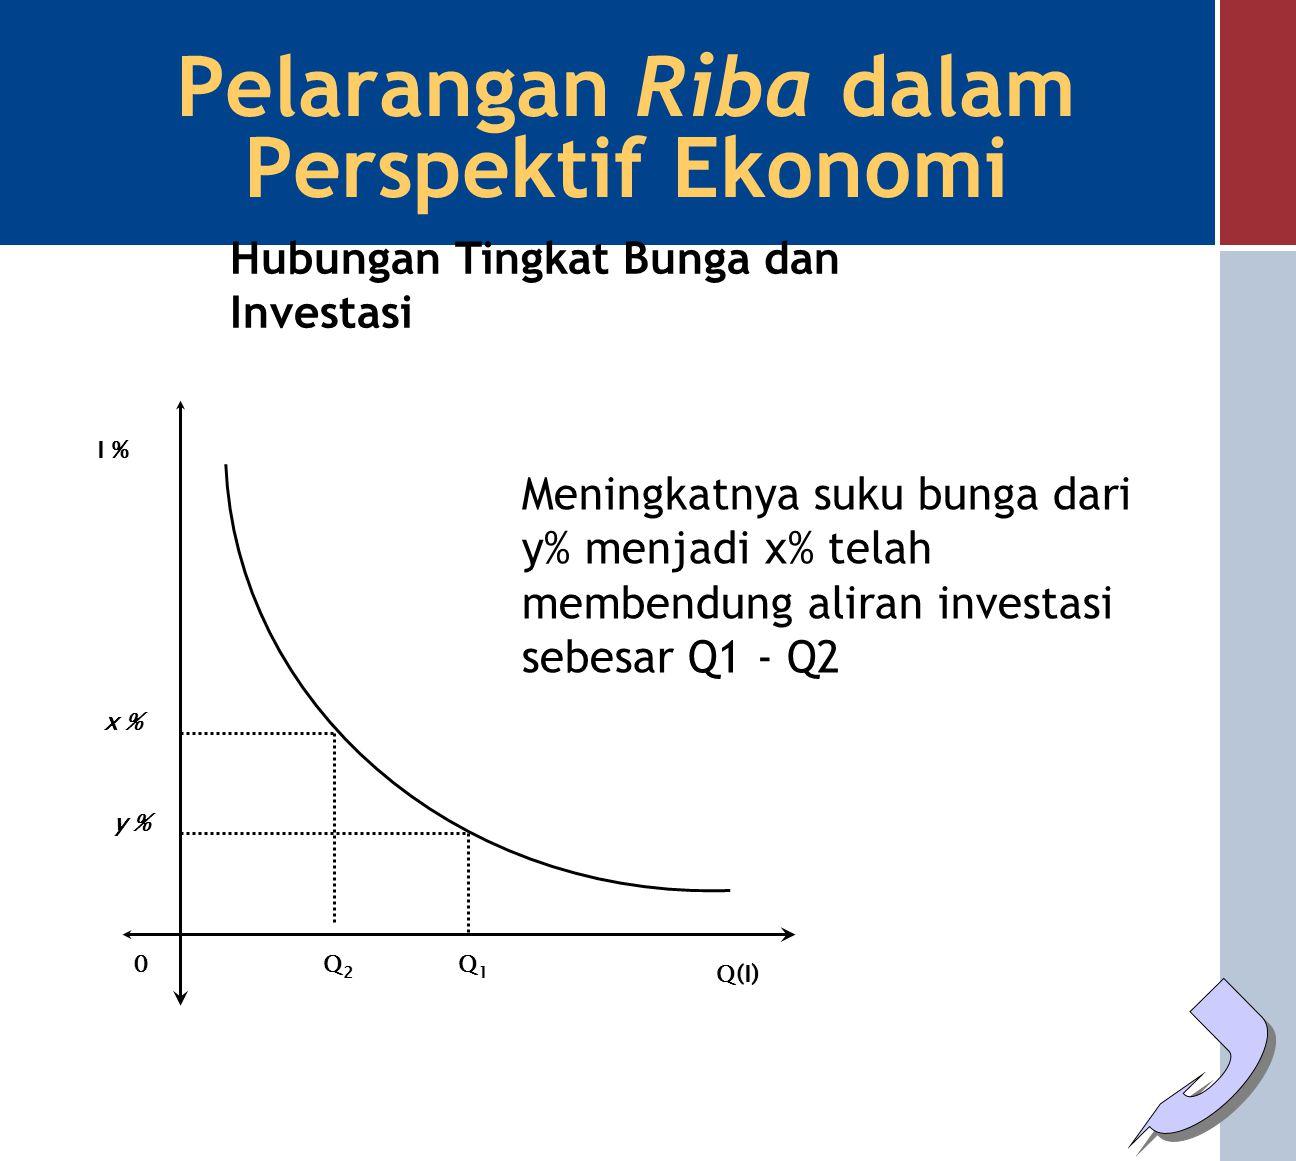 Pelarangan Riba dalam Perspektif Ekonomi laba ~ Rugi ~ 0 X % Aliran Investasi yang Terbendung (Tidak Optimal) Semakin tinggi suku bunga maka semakin besar kemungkinan aliran investasi yang terbendung